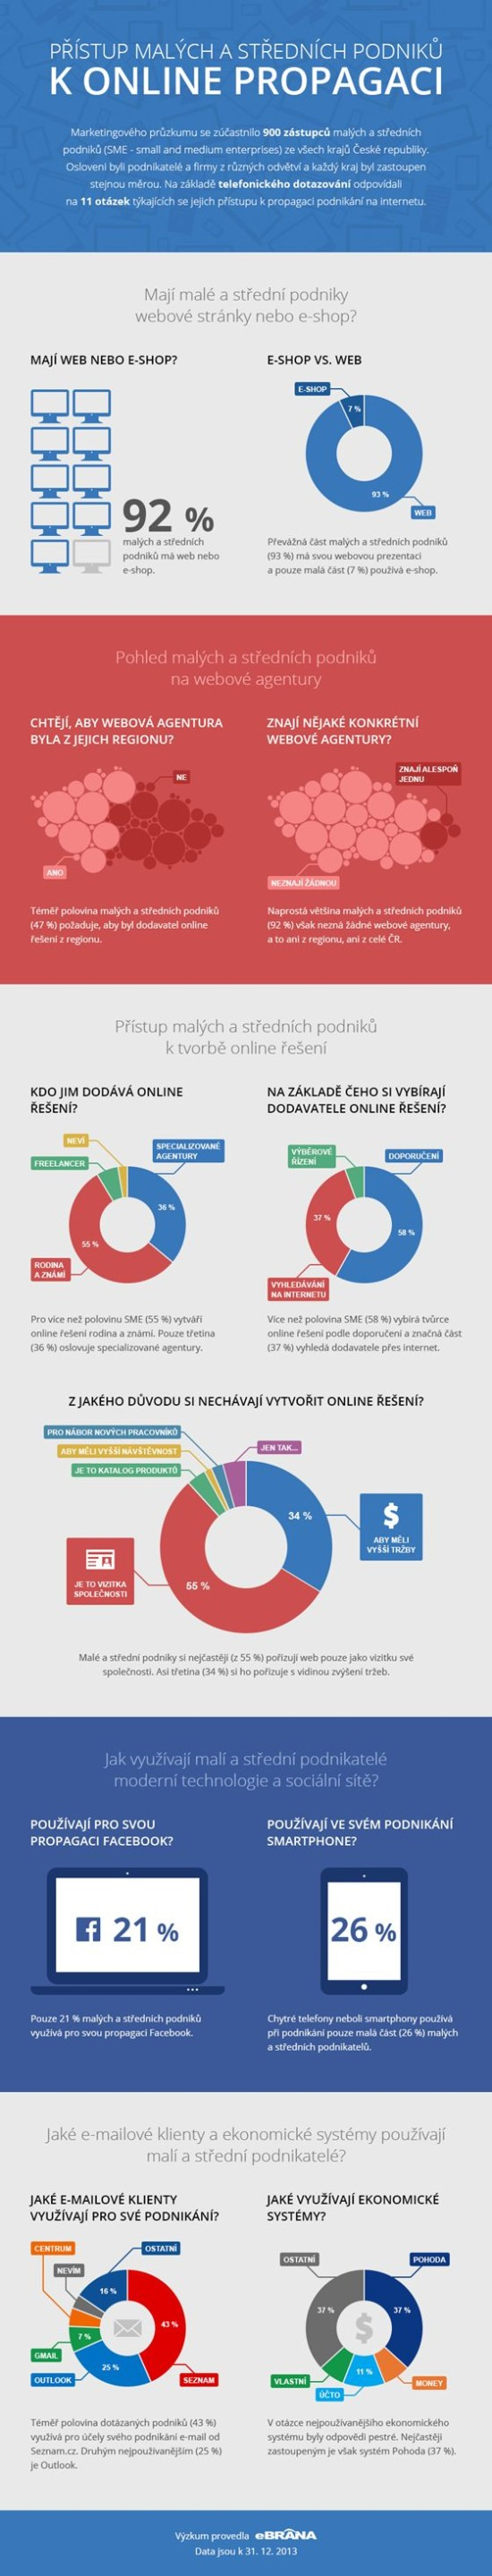 Pristup malych a strednich podniku k online propagaci - infografika